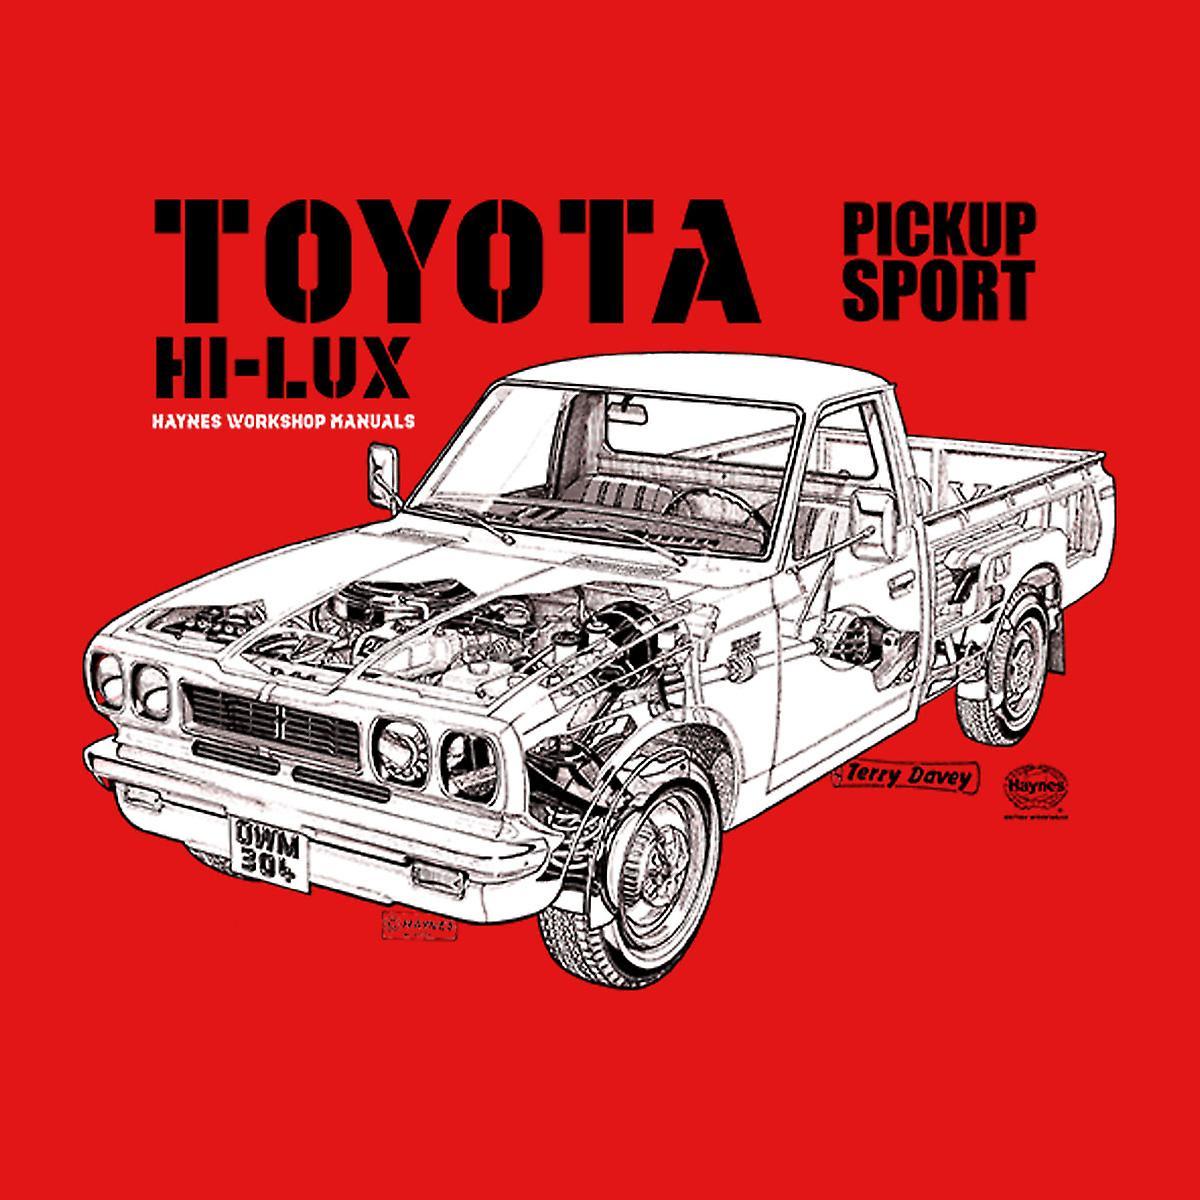 Haynes Workshop manuell Toyota Hei Lux svart menn Varsity jakke